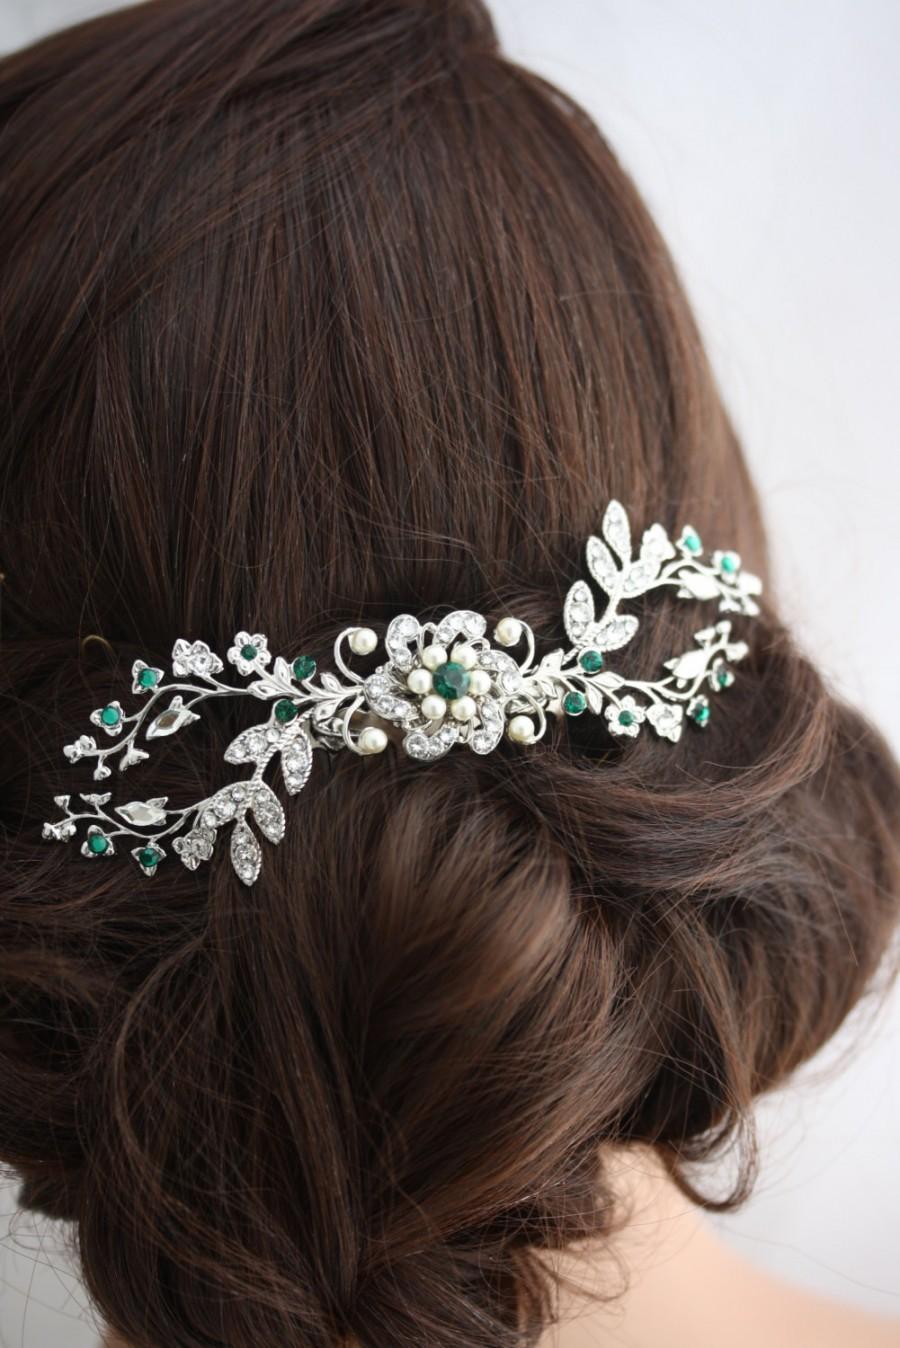 Hochzeit - Wedding Hair Comb Emerald Green Crystal Bridal Headpiece Vintage Vine Comb Crystal Headpiece Wedding Hair Accessories  SPLENDID SABINE COMB